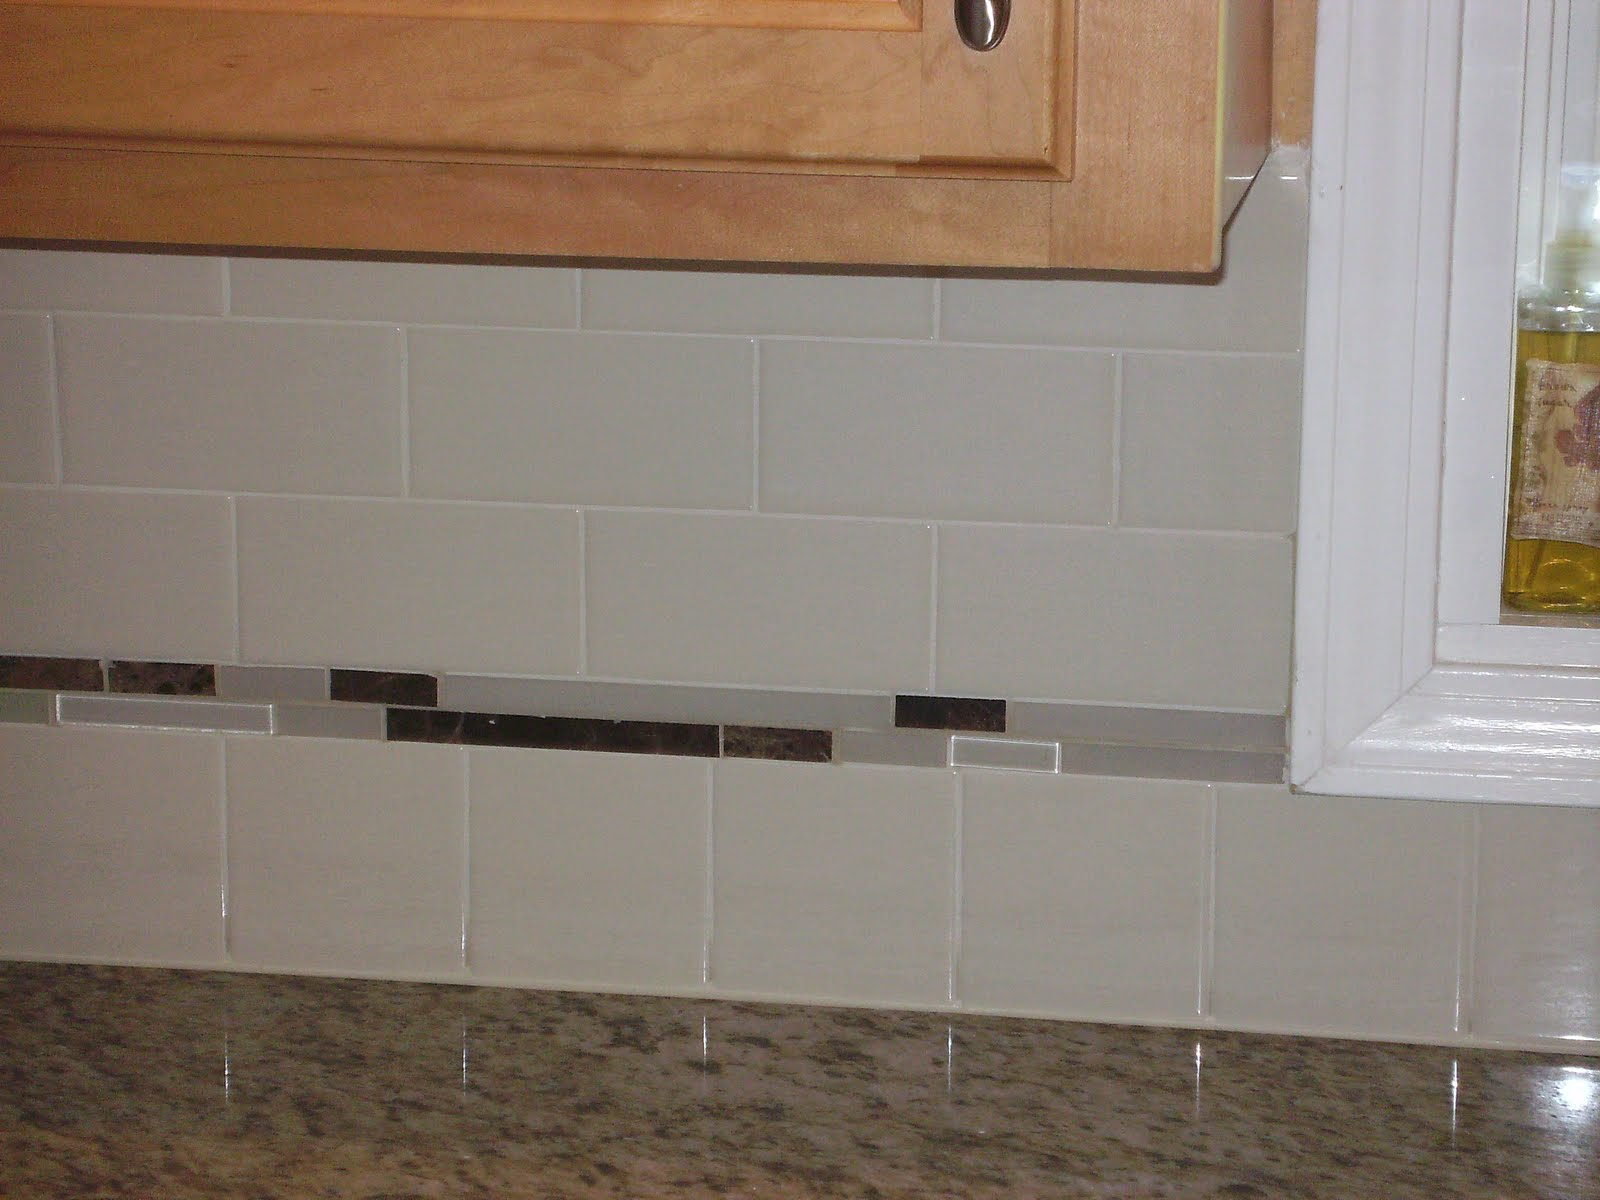 Knapp Tile and Flooring, Inc.: Subway Tile Backsplash